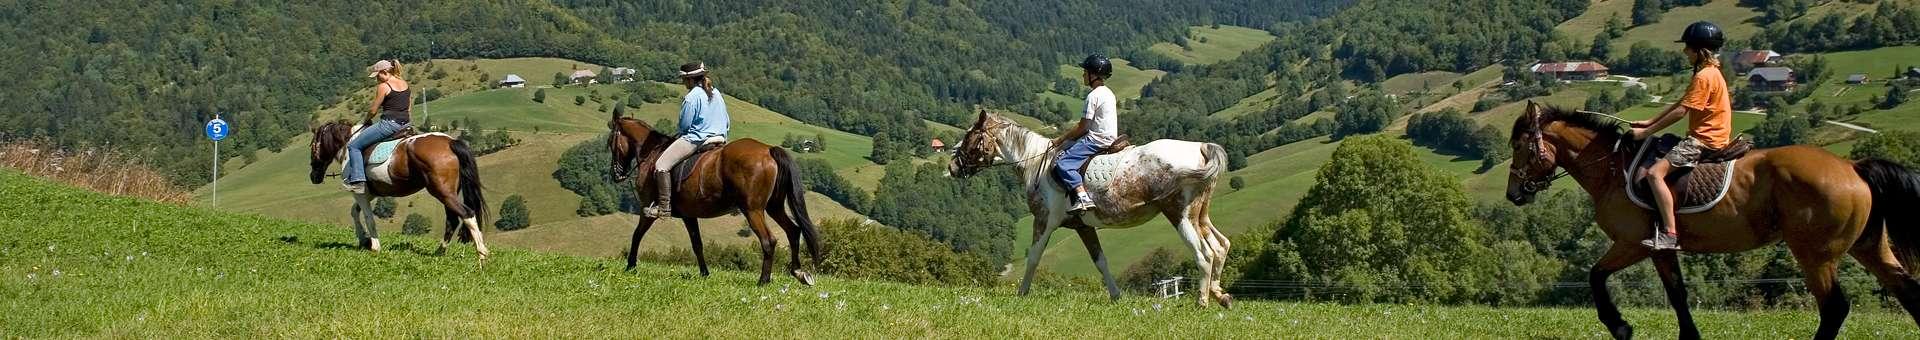 equitation-938